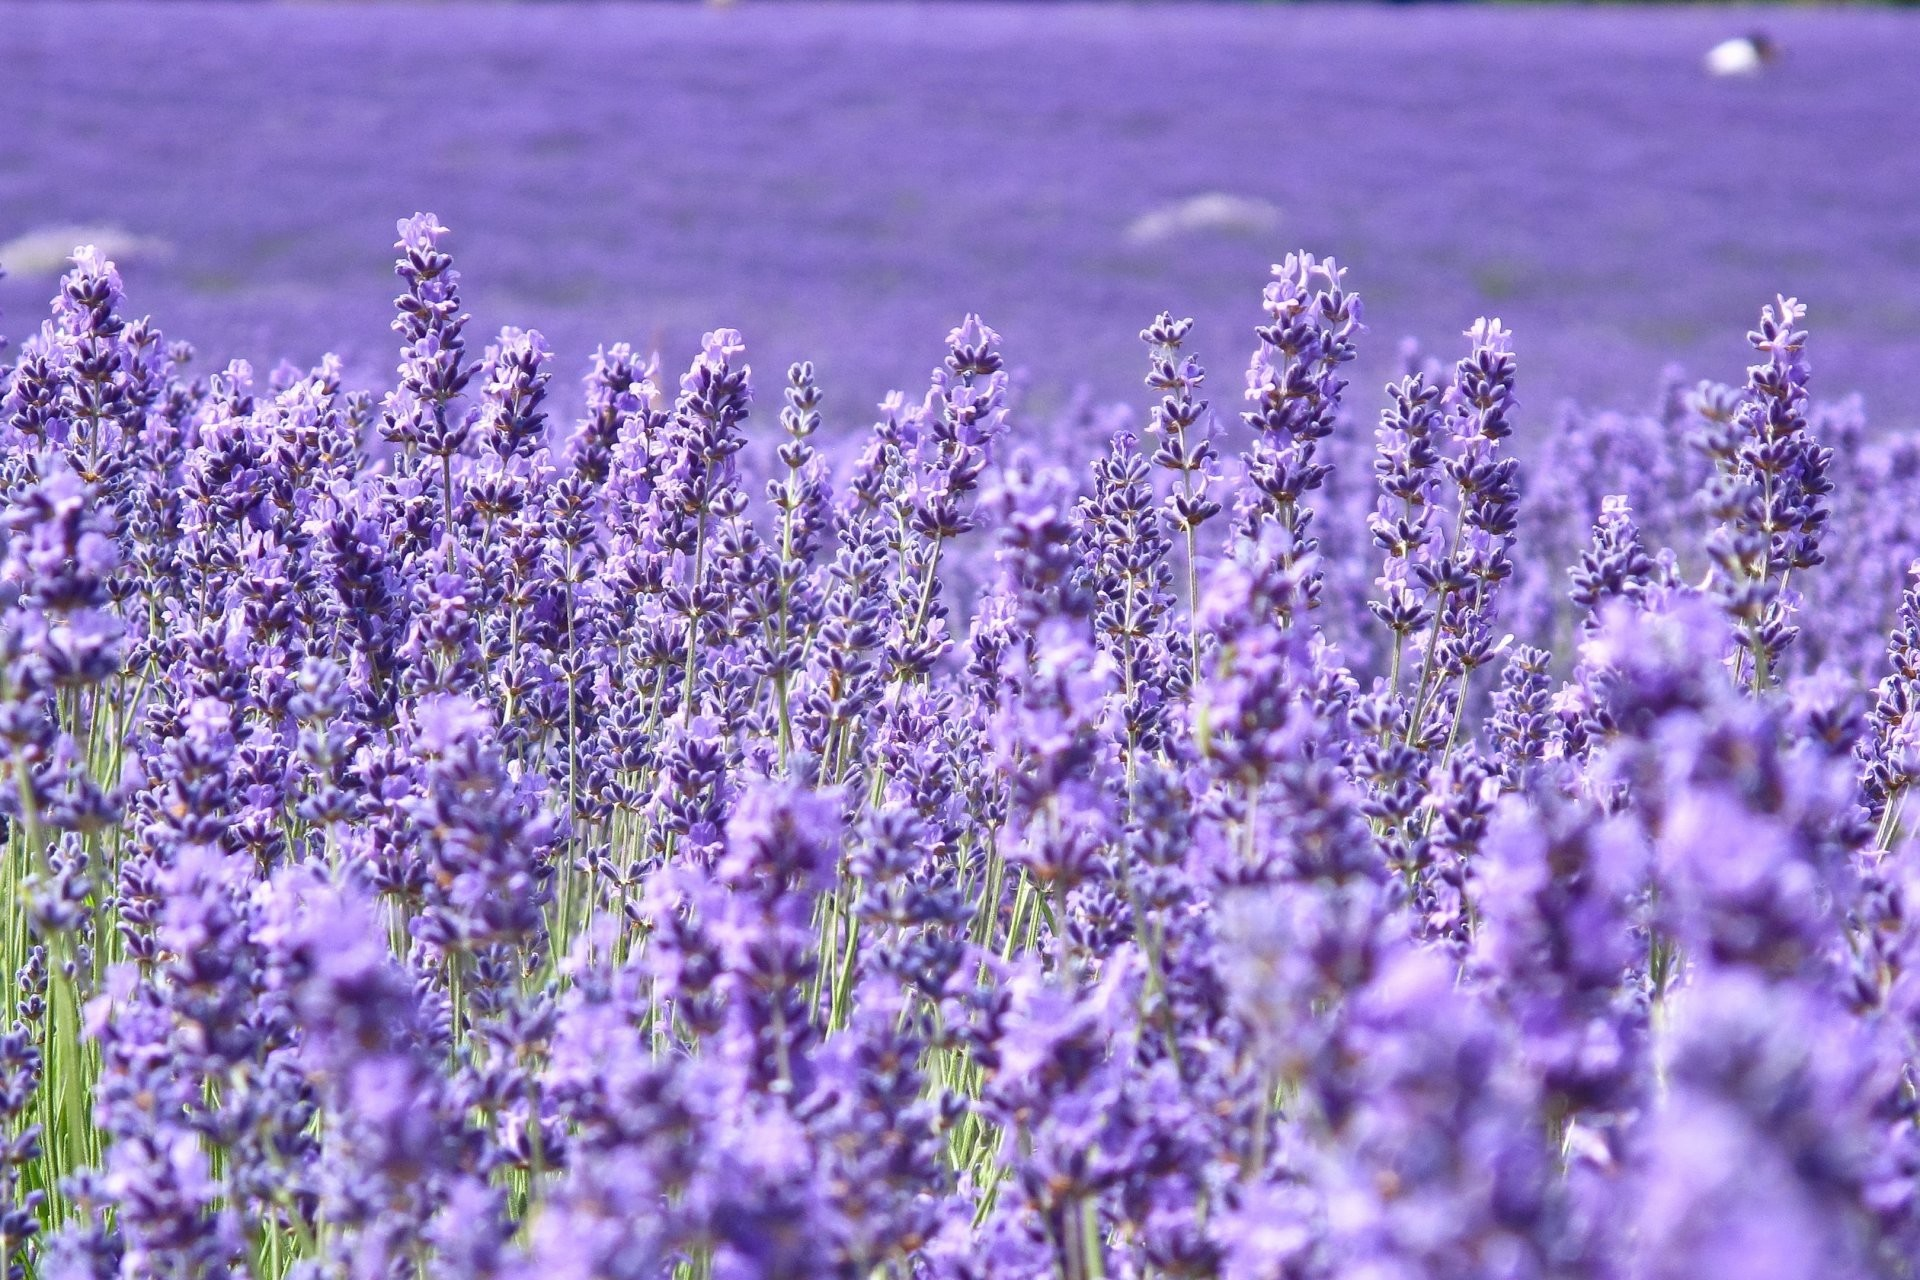 flower flowers lavender purple the field of the field blur background  wallpaper widescreen full screen widescreen